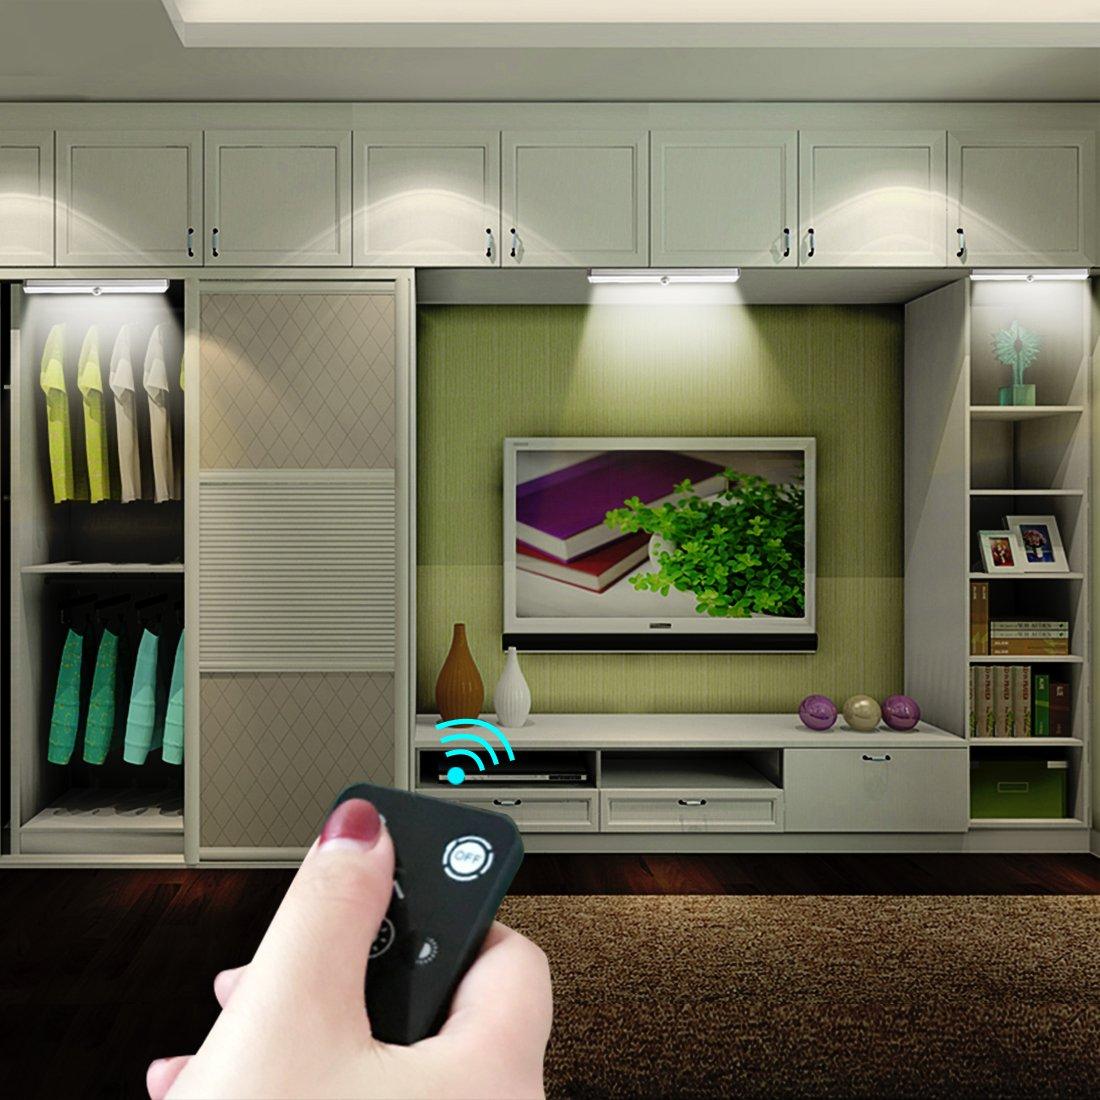 Charmant Küche Unter Gegenbeleuchtung Bilder - Küche Set Ideen ...